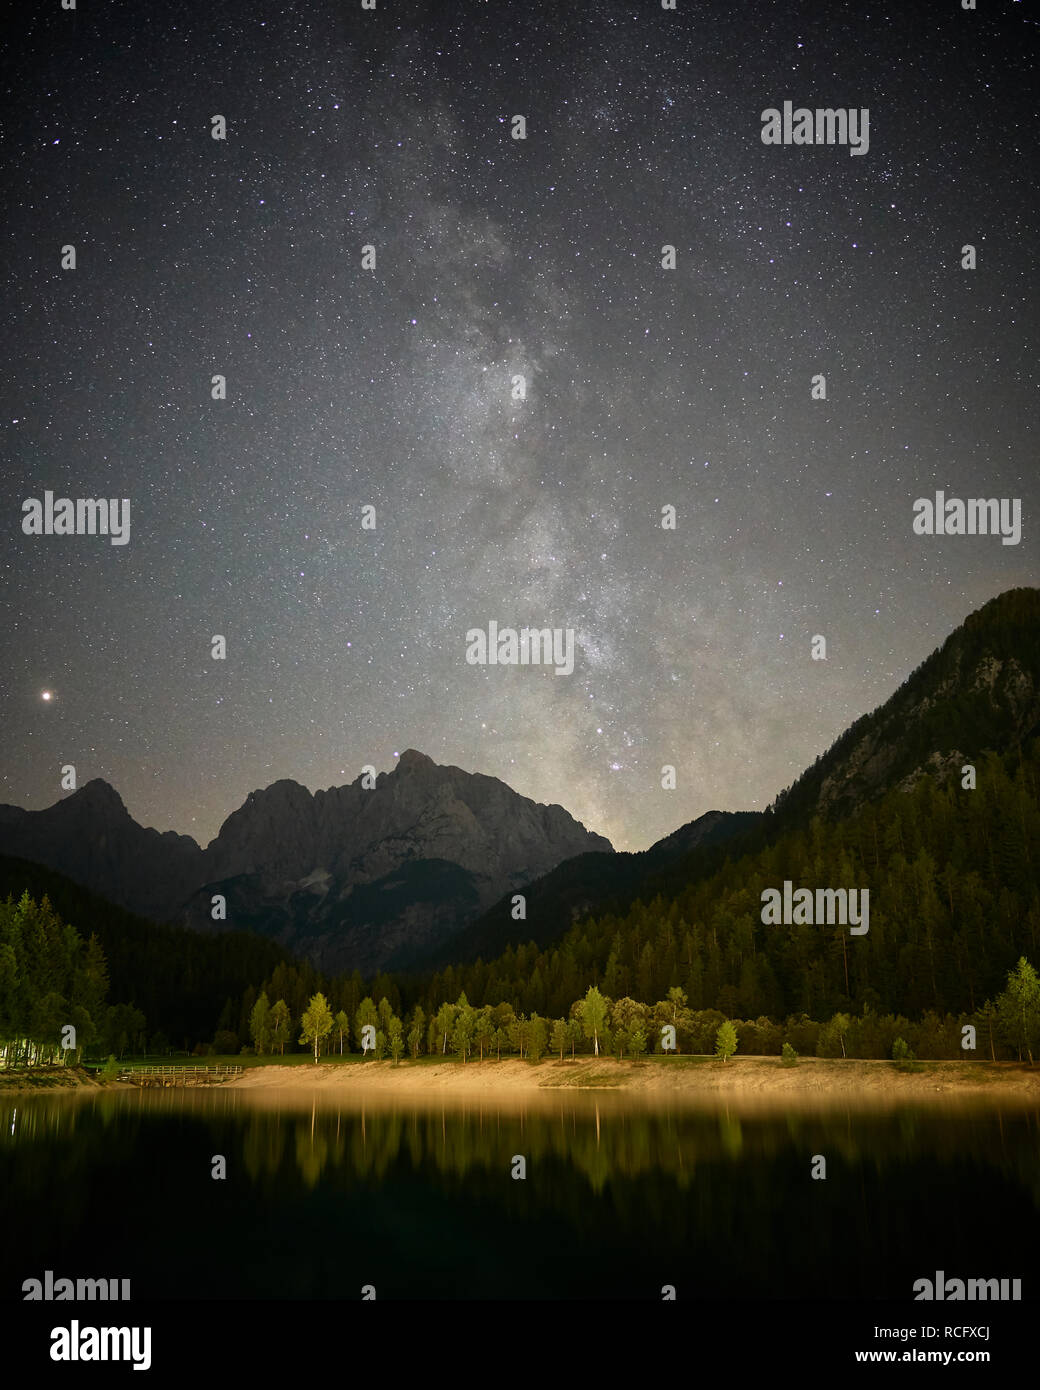 View of the Milky Way over Jasna Lake and the Julian Alps, near Kranjska Gora, Gorenjska, Slovenia - Stock Image